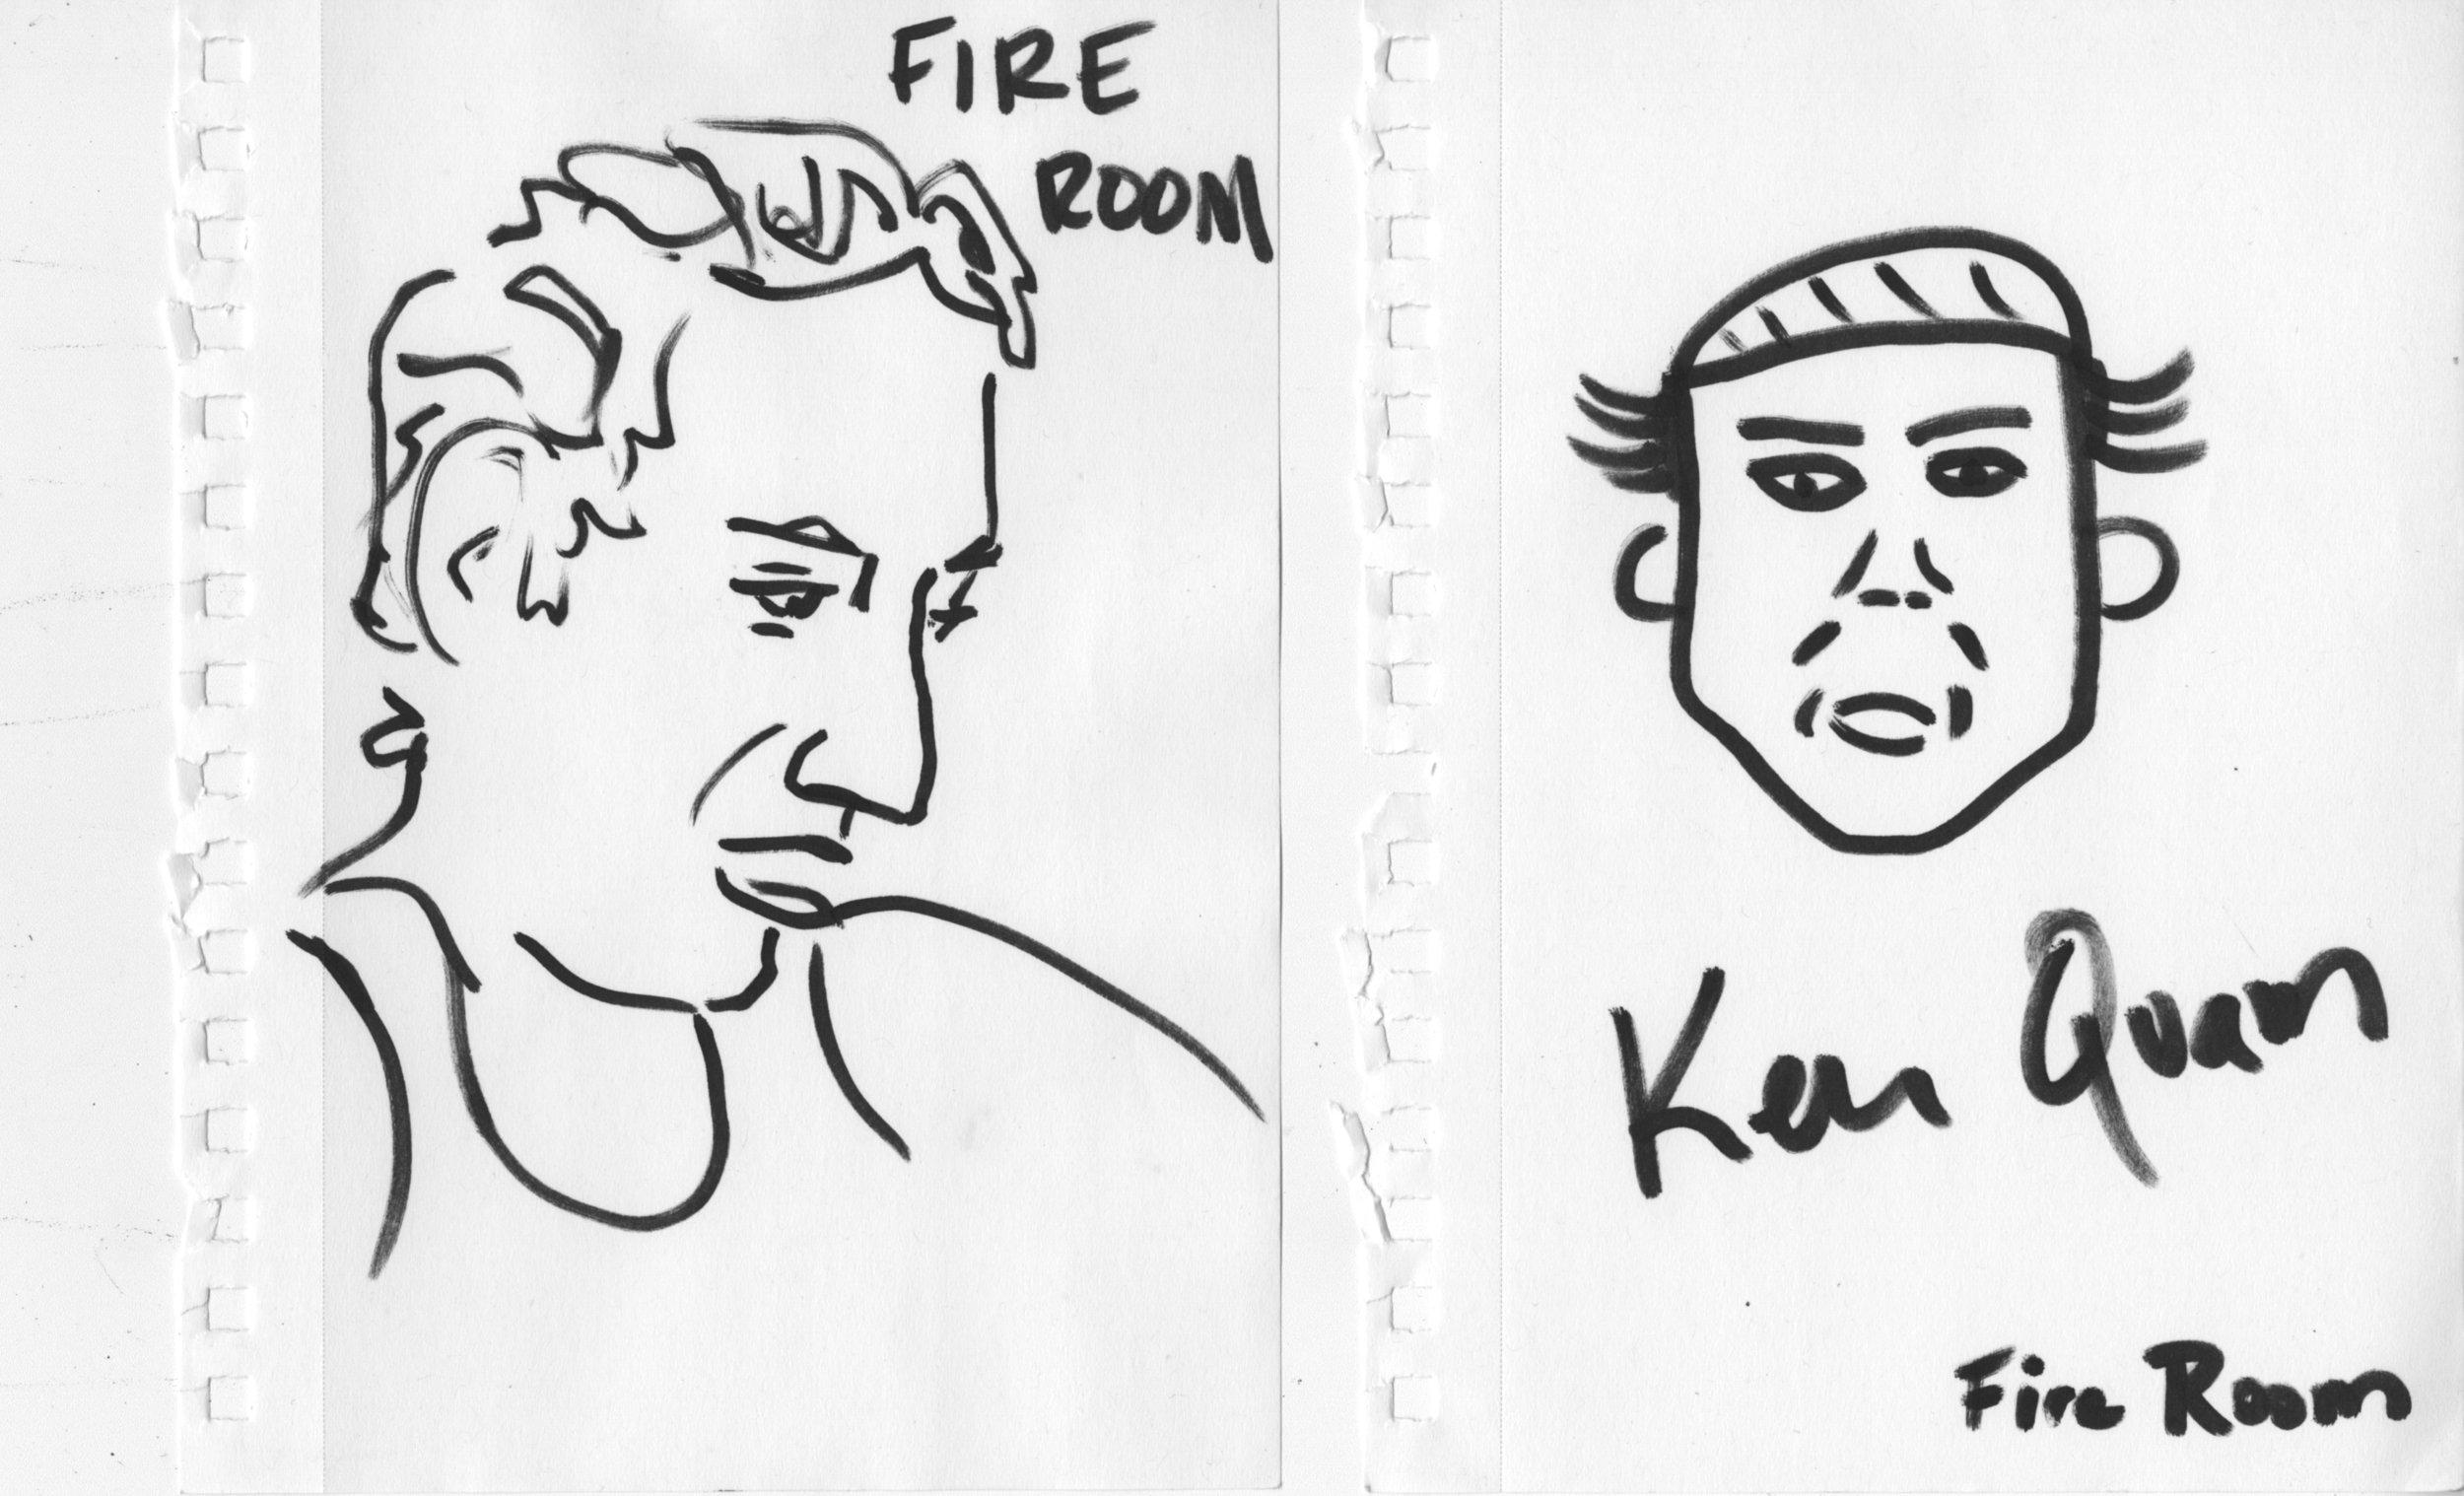 6_Ken_Fire Room.jpg